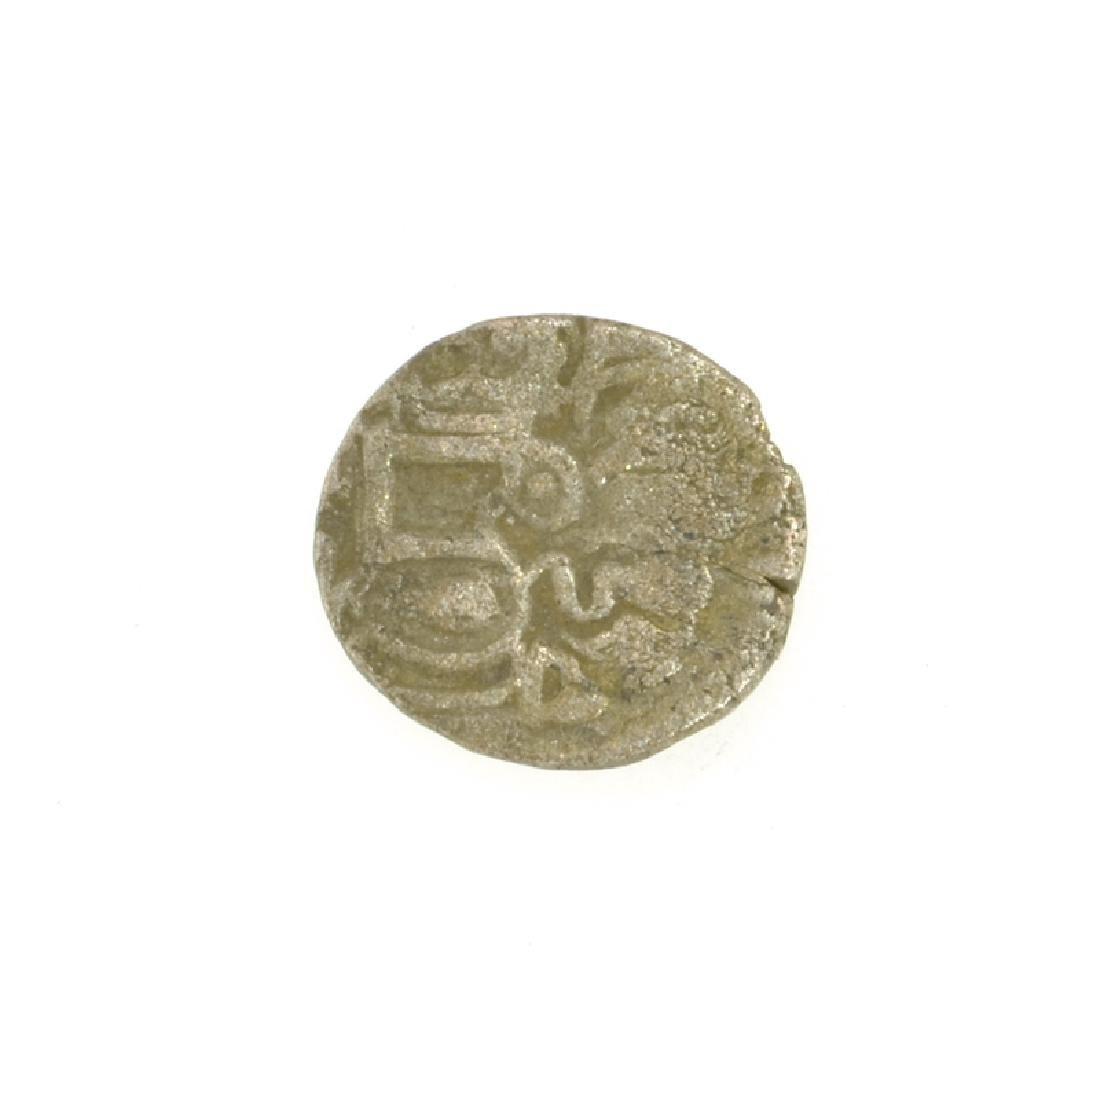 Bull And Horse Jital Circa 300 BC Coin - 2